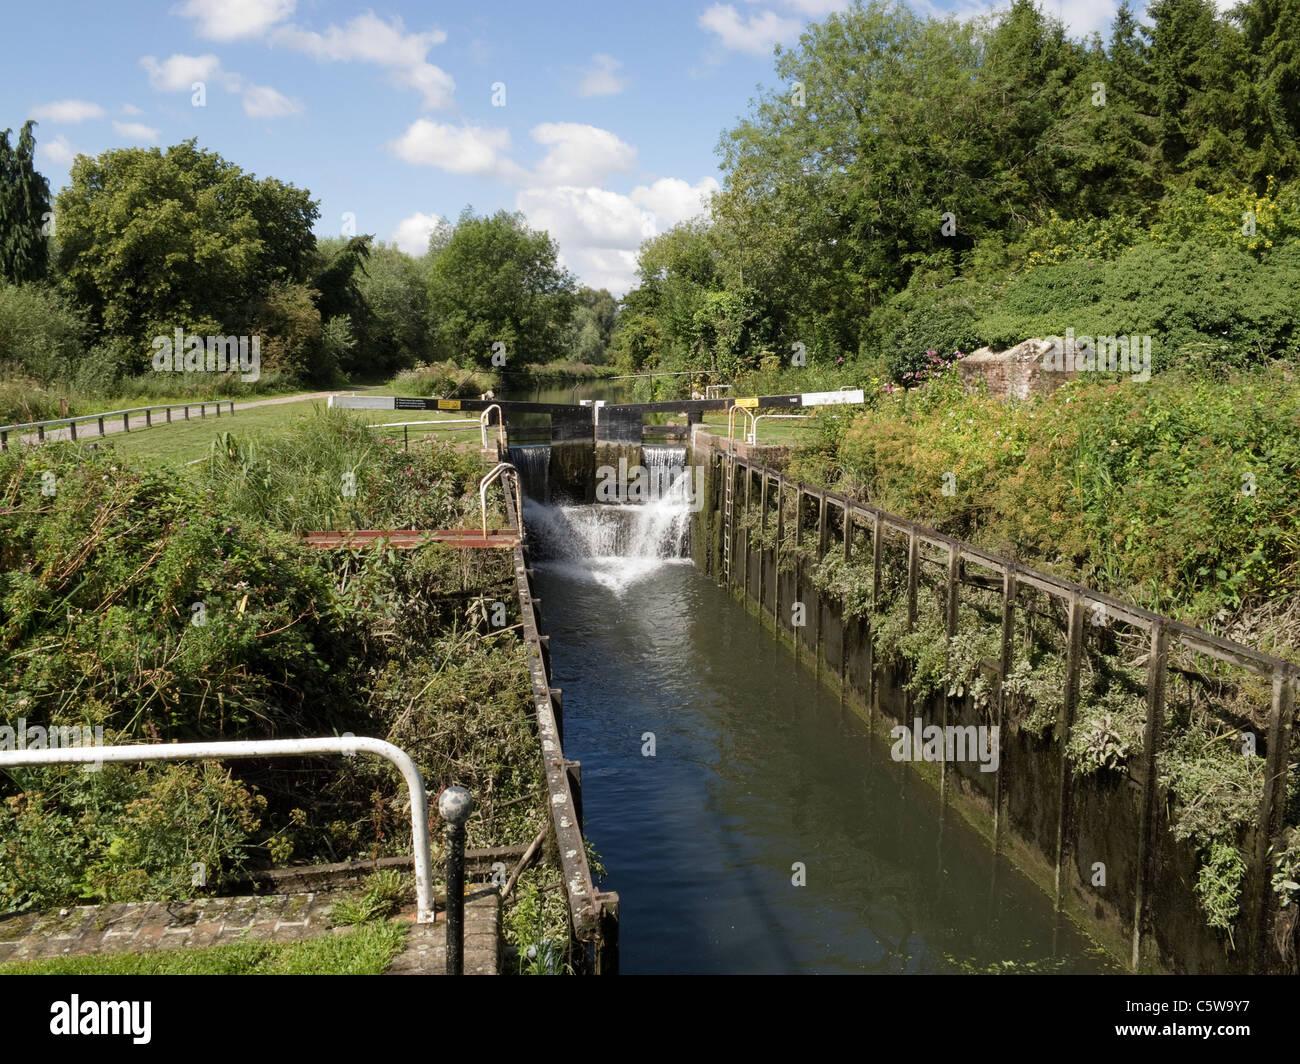 Garston Turf Sided Lock, Kennet and Avon Canal, Berkshire, UK -2 - Stock Image